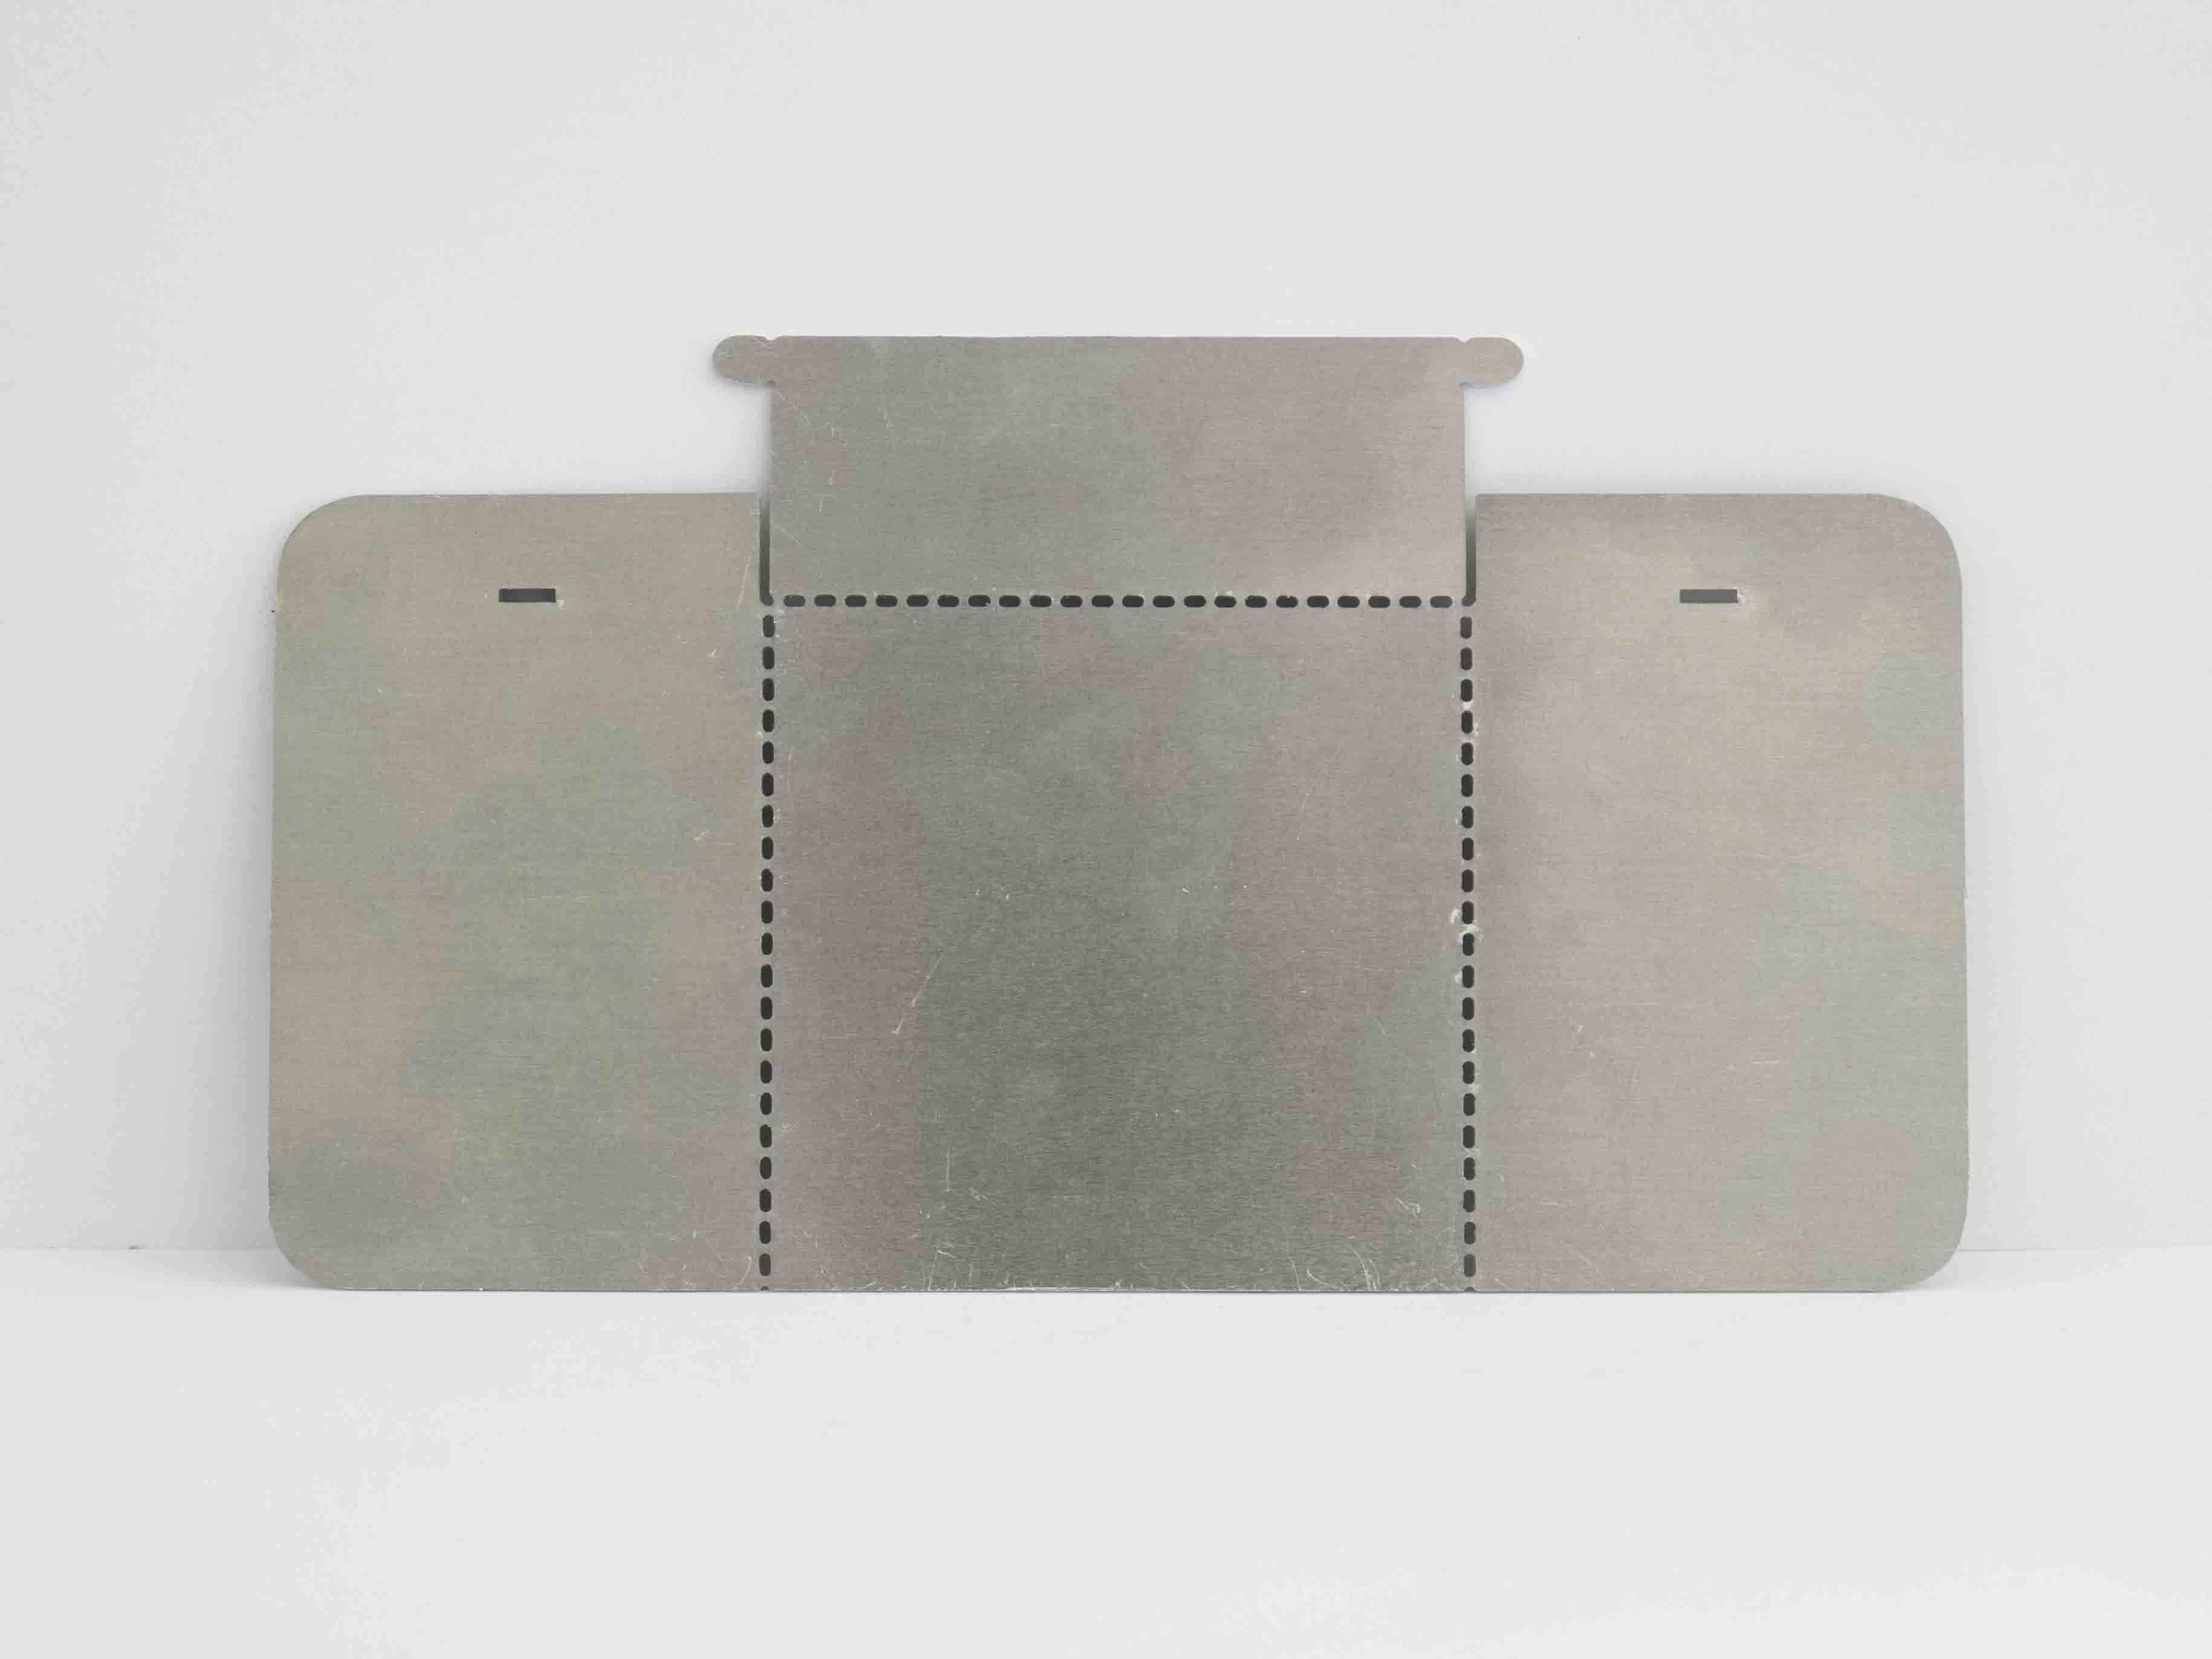 maser cut metal box template